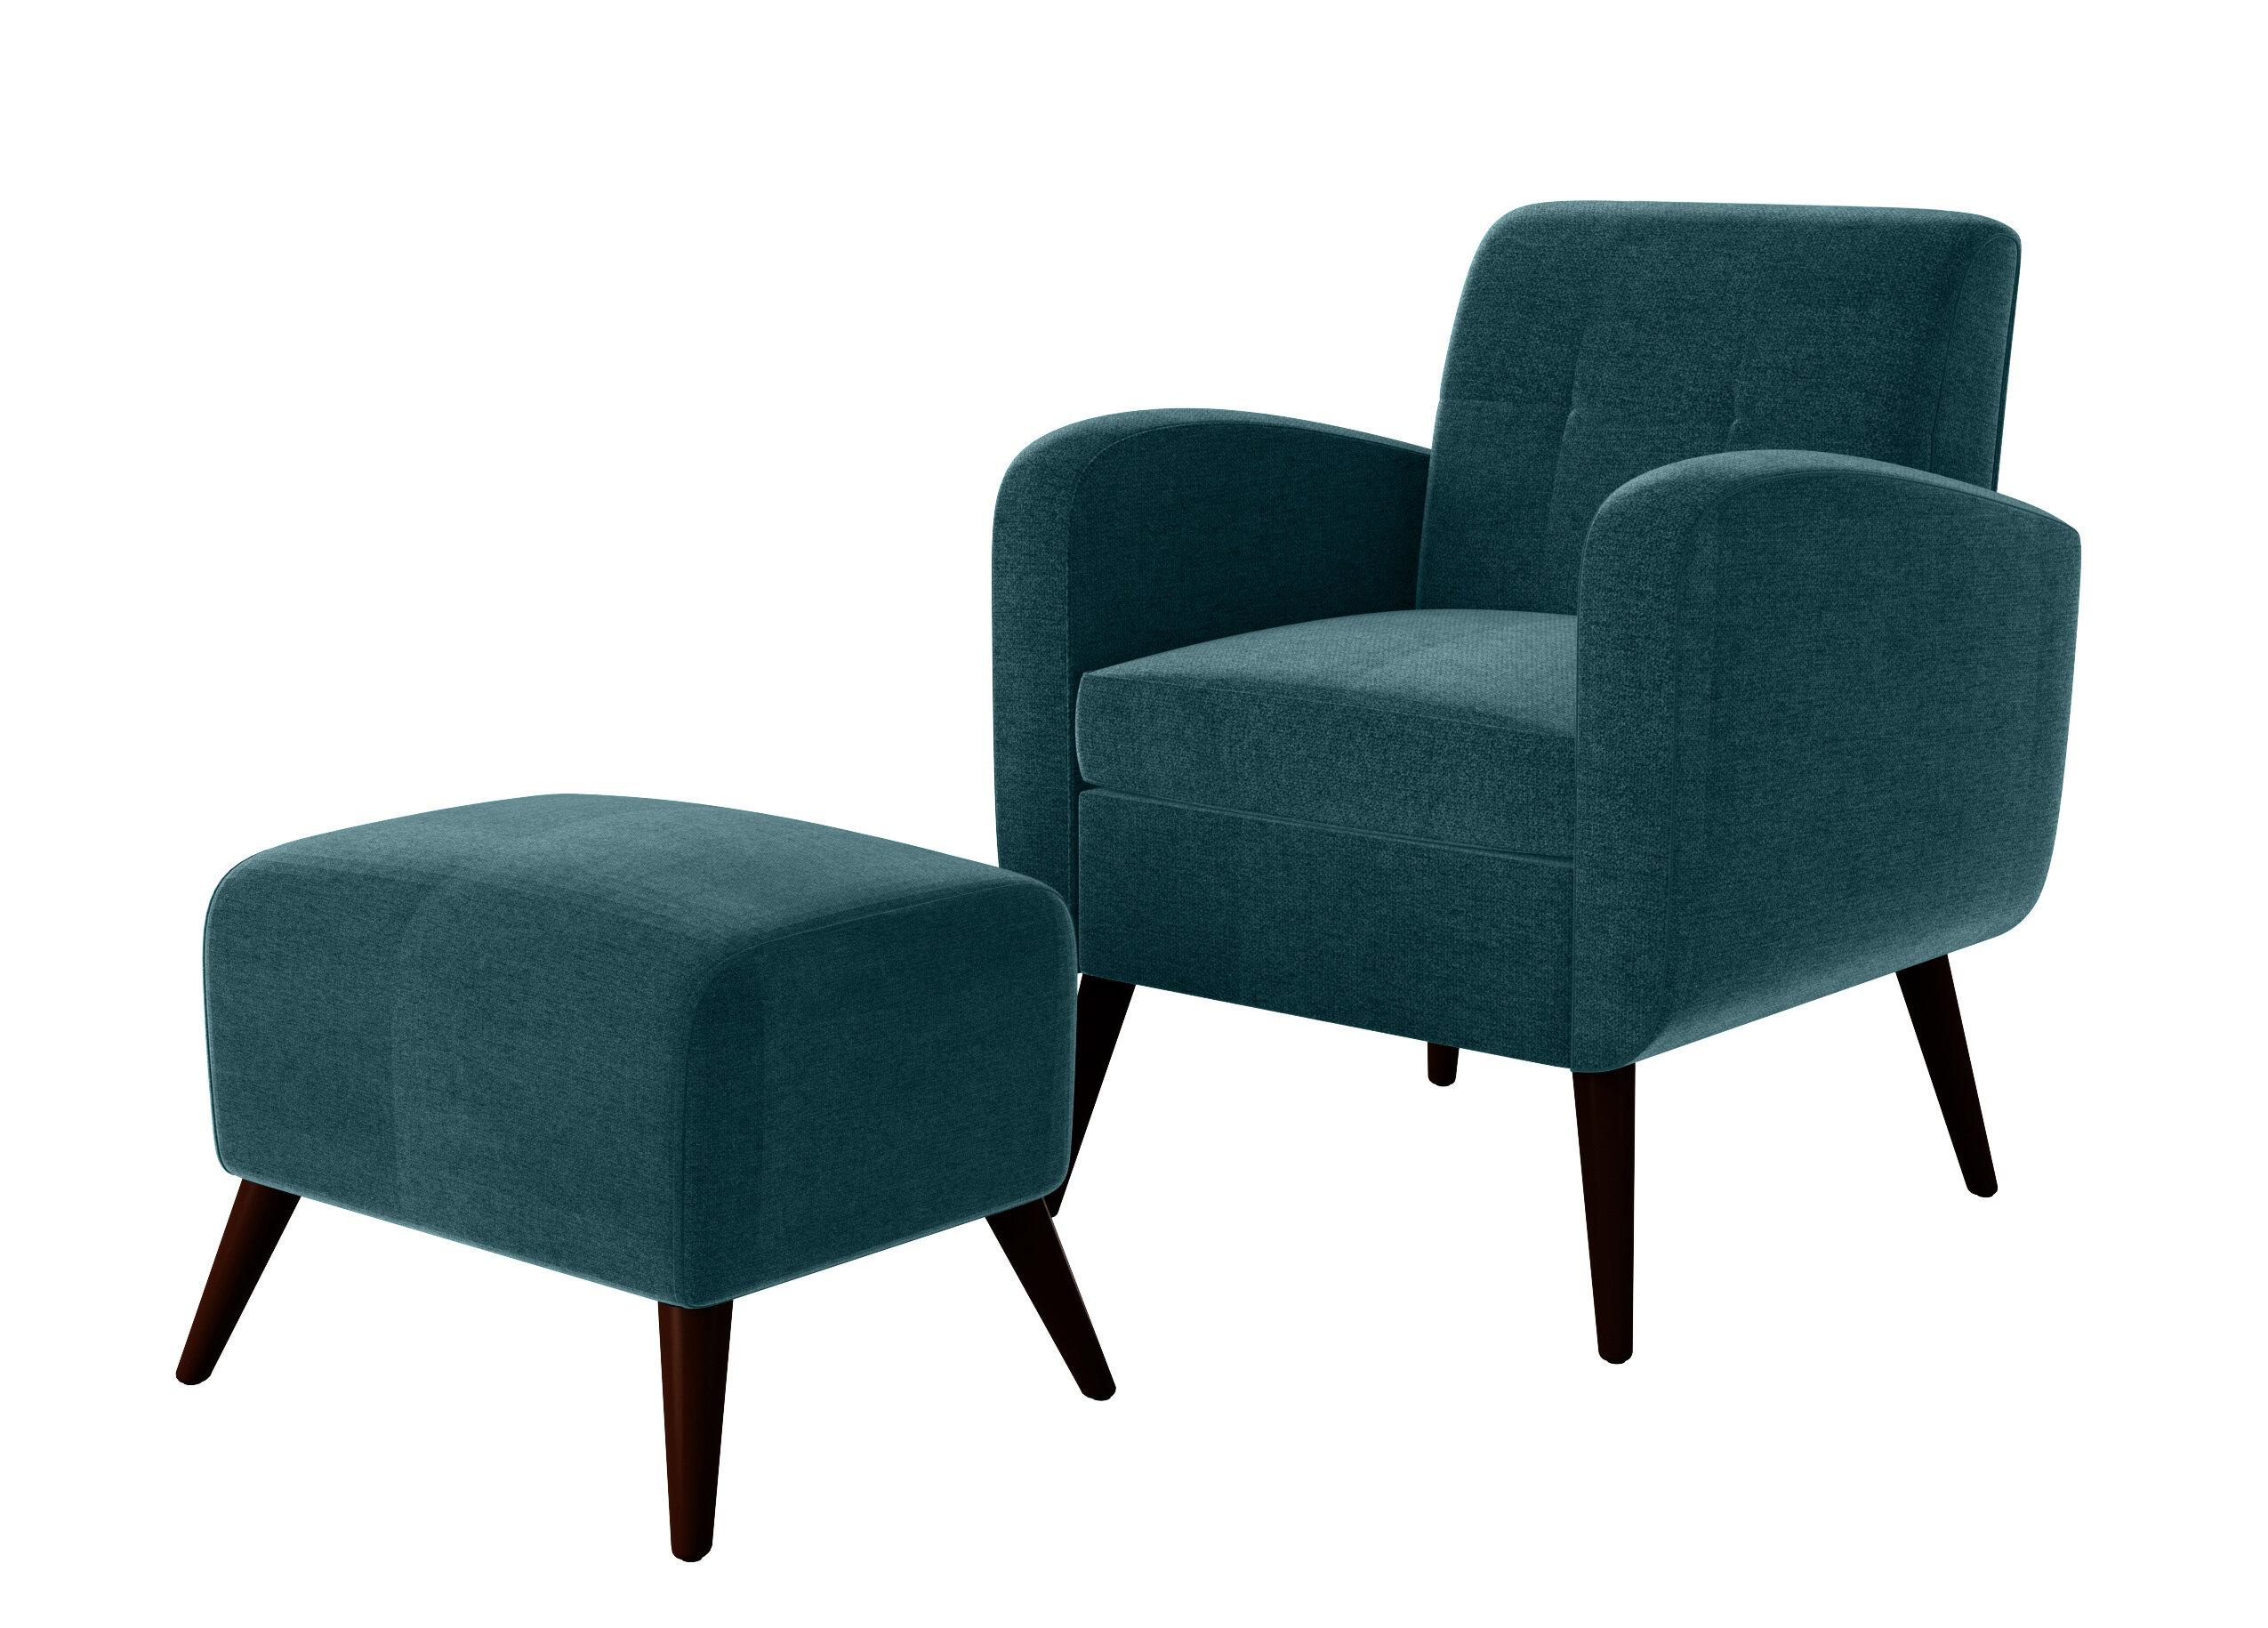 george oliver joetta 20 armchair and ottoman w